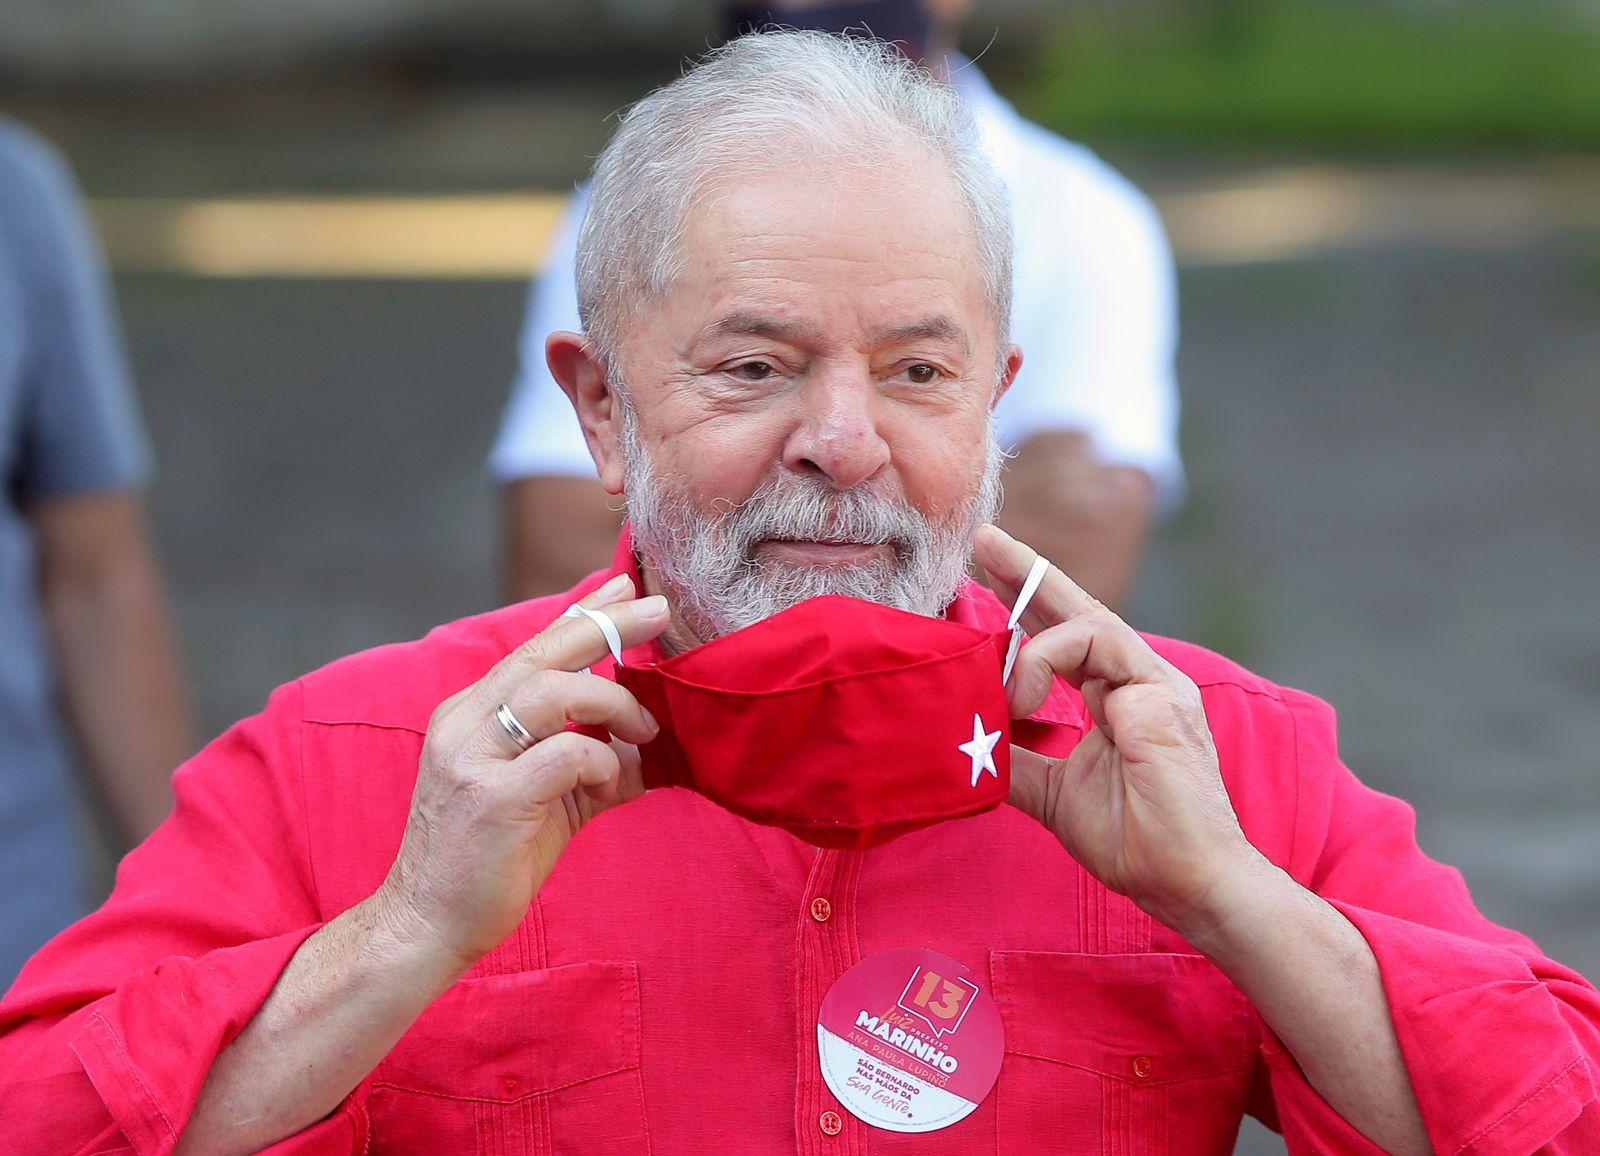 FILE PHOTO: Municipal elections in Brazil